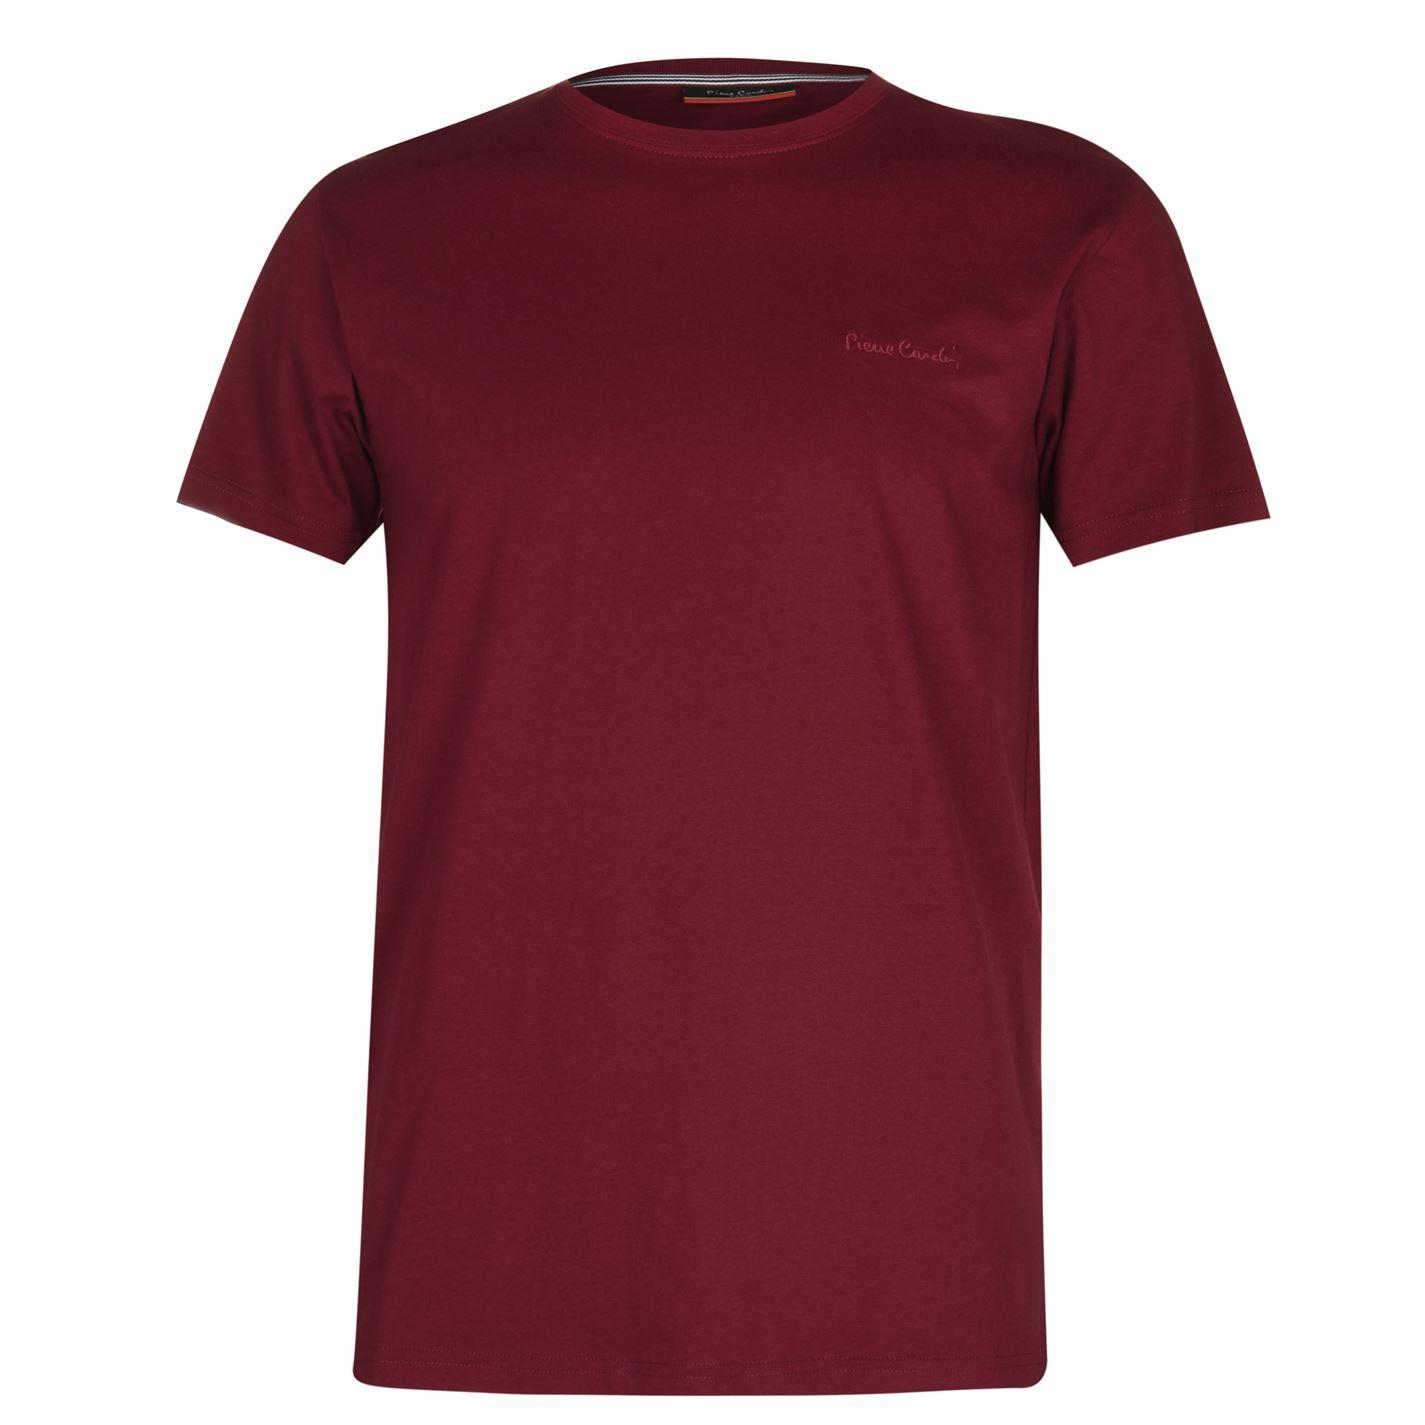 Mergi la Tricouri simple sport Pierre Cardin pentru Barbati roz inchis